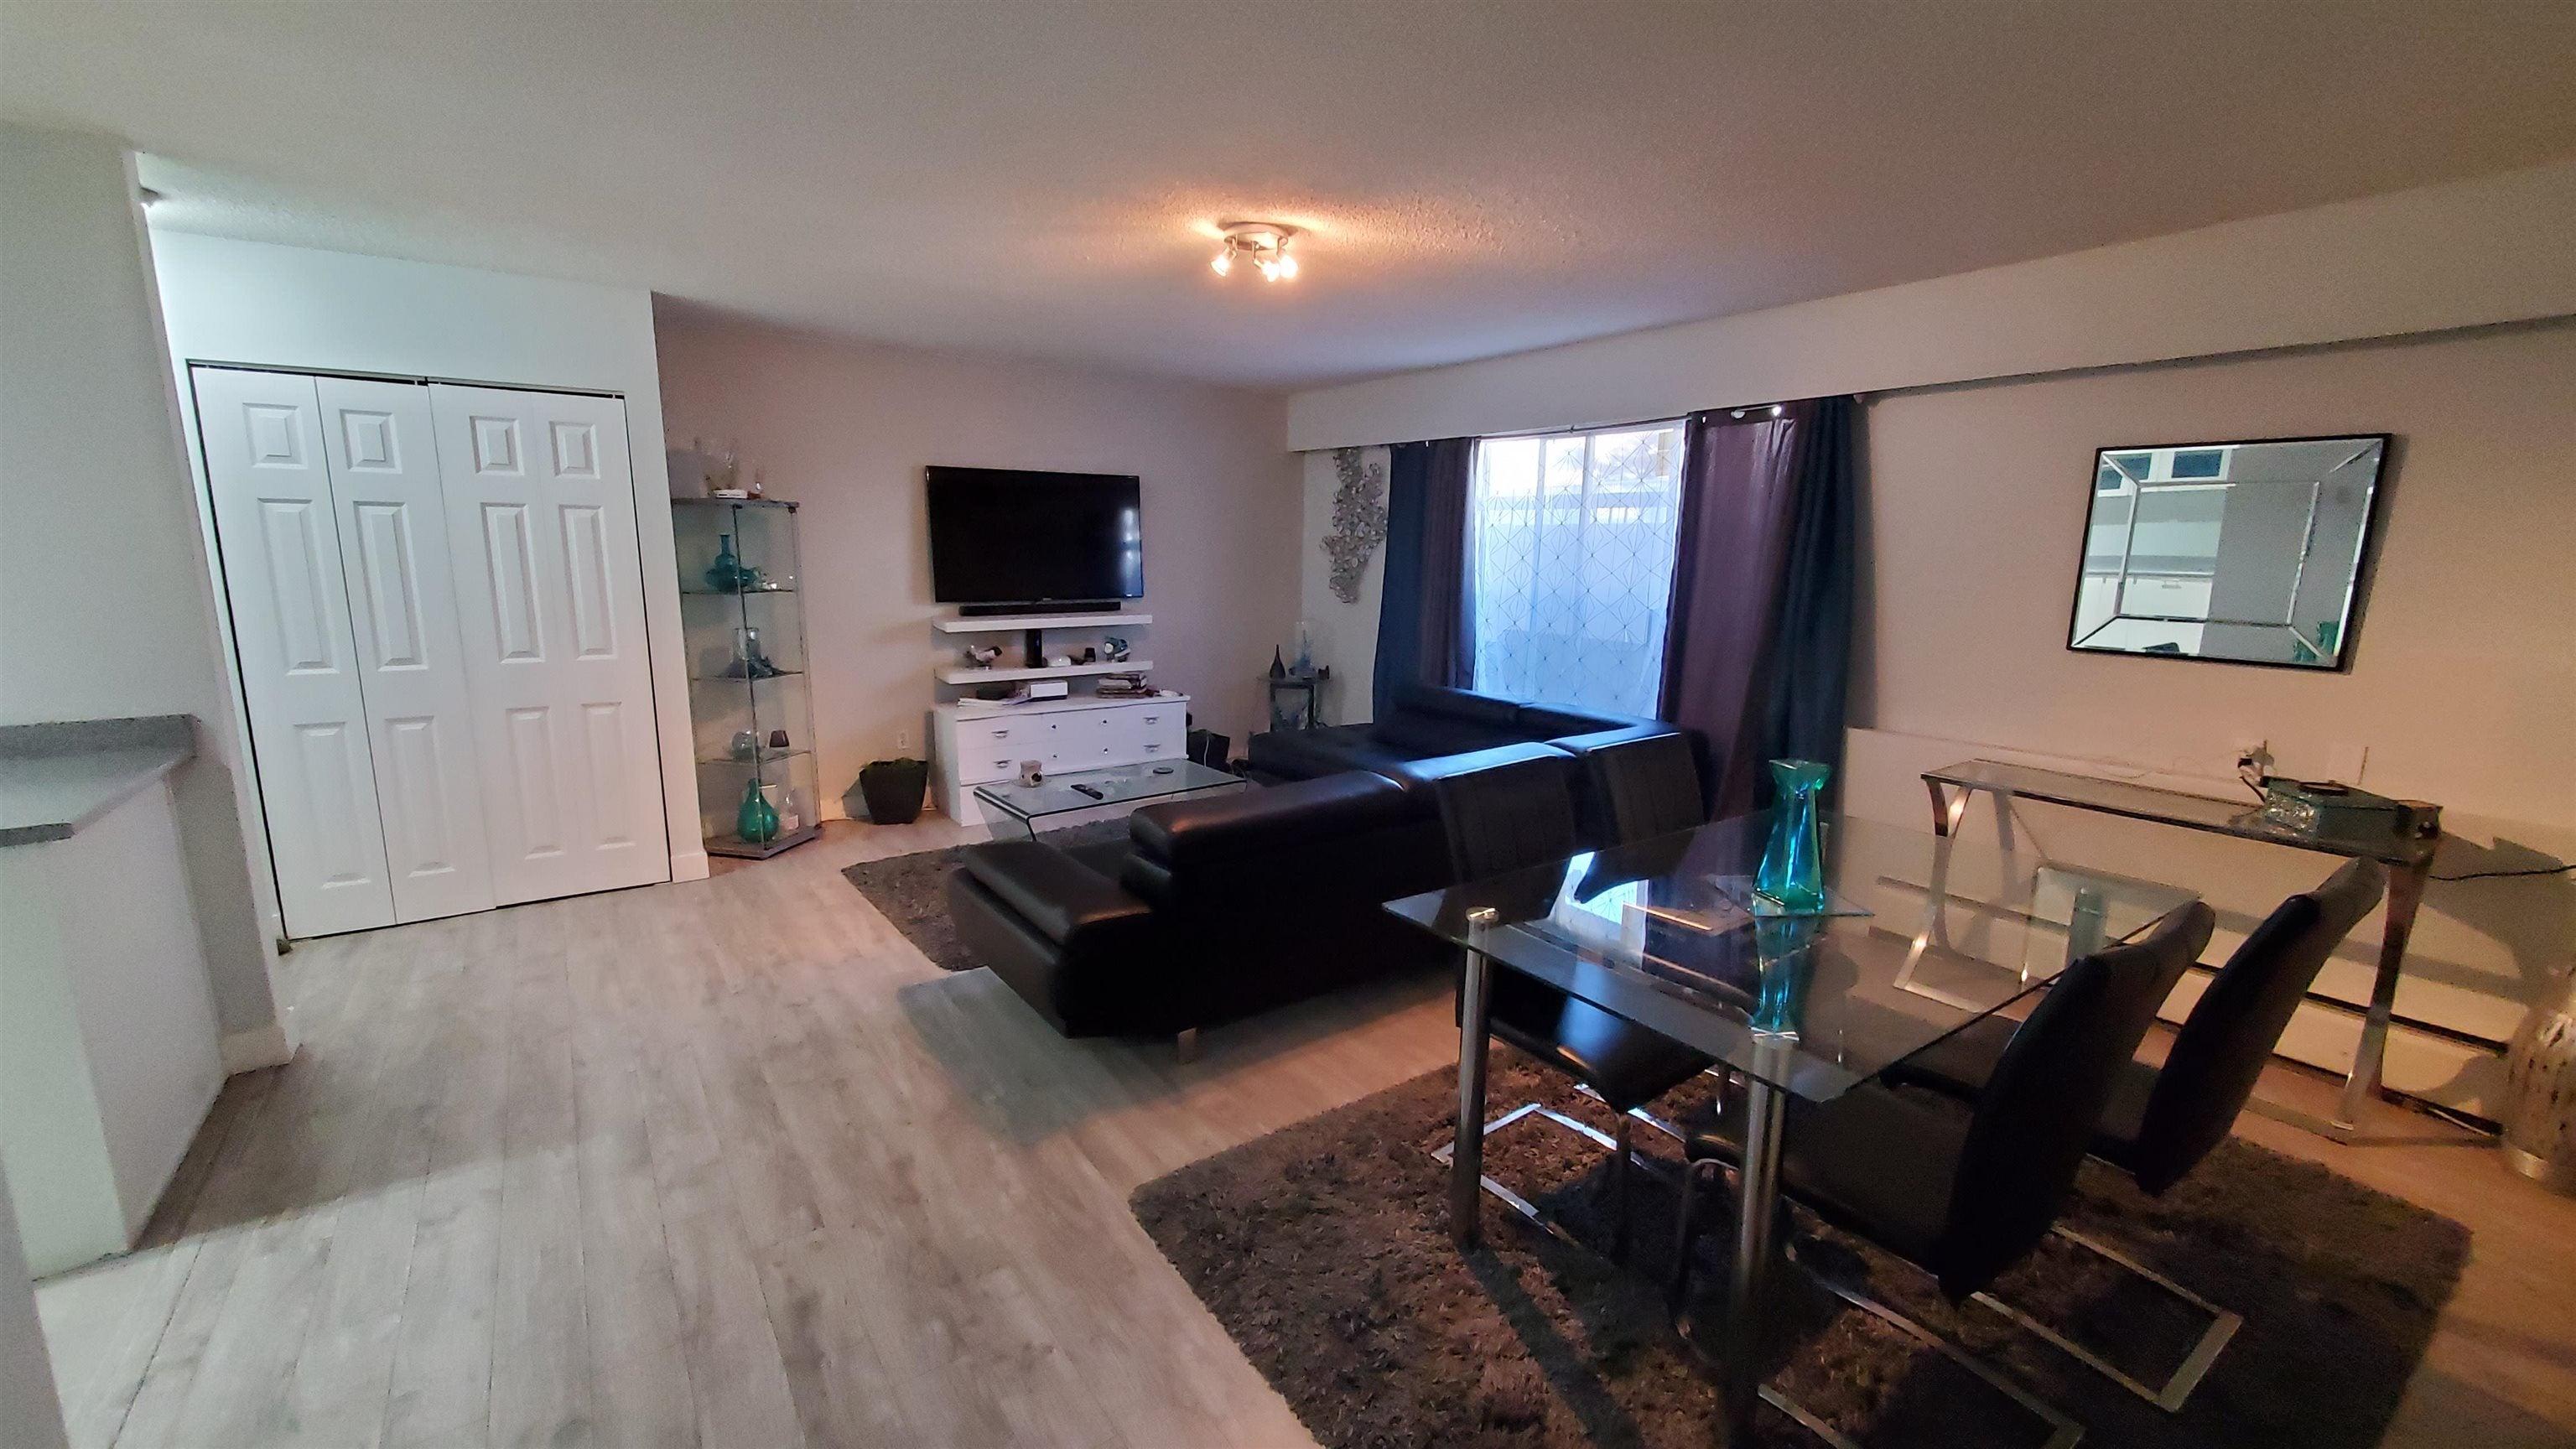 120 11806 88 AVENUE - Annieville Apartment/Condo for sale, 2 Bedrooms (R2616862) - #5